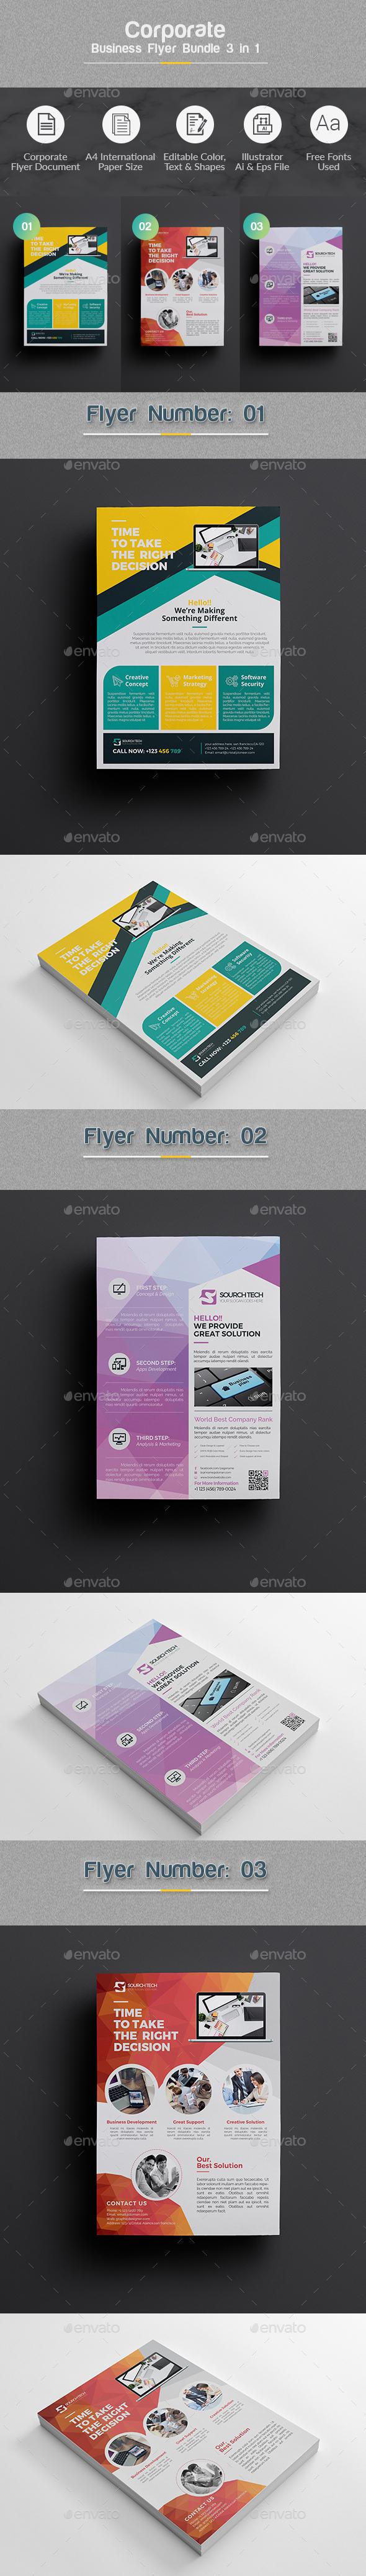 Flyer Bundle 3 in 1 - Corporate Flyers